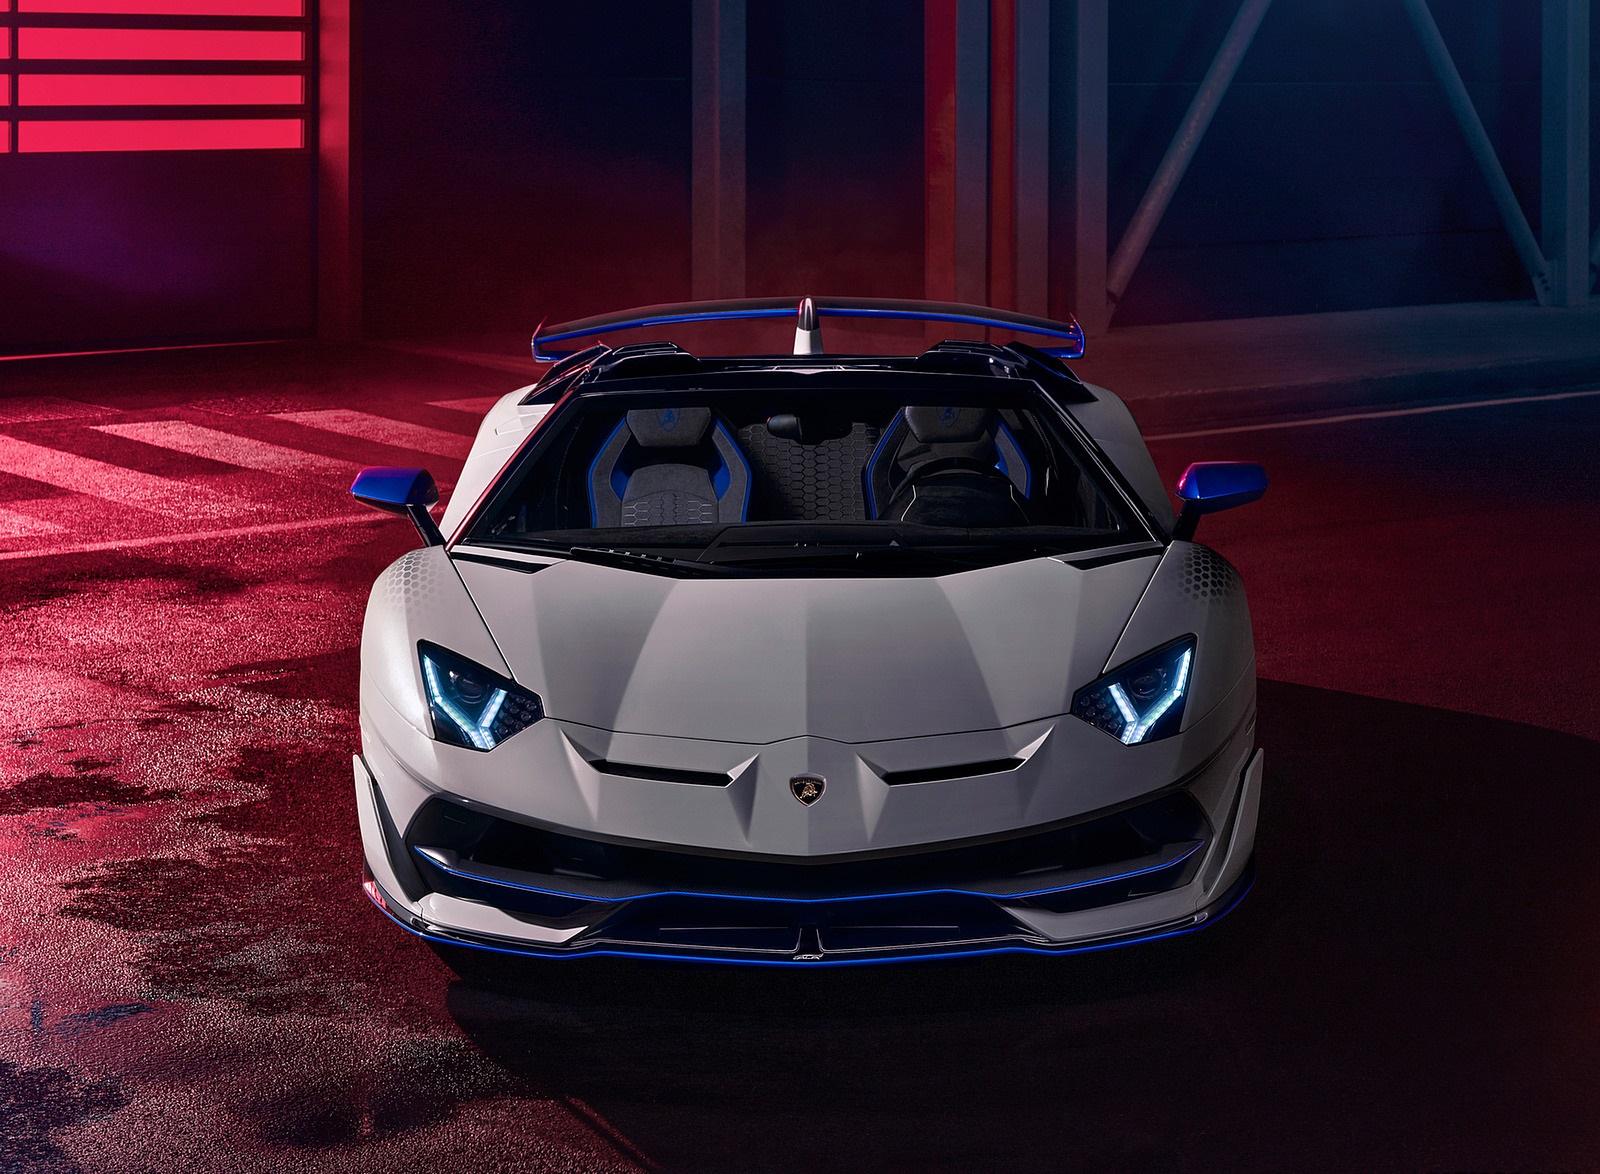 2020 Lamborghini Aventador SVJ Xago Edition Front Wallpapers #3 of 12